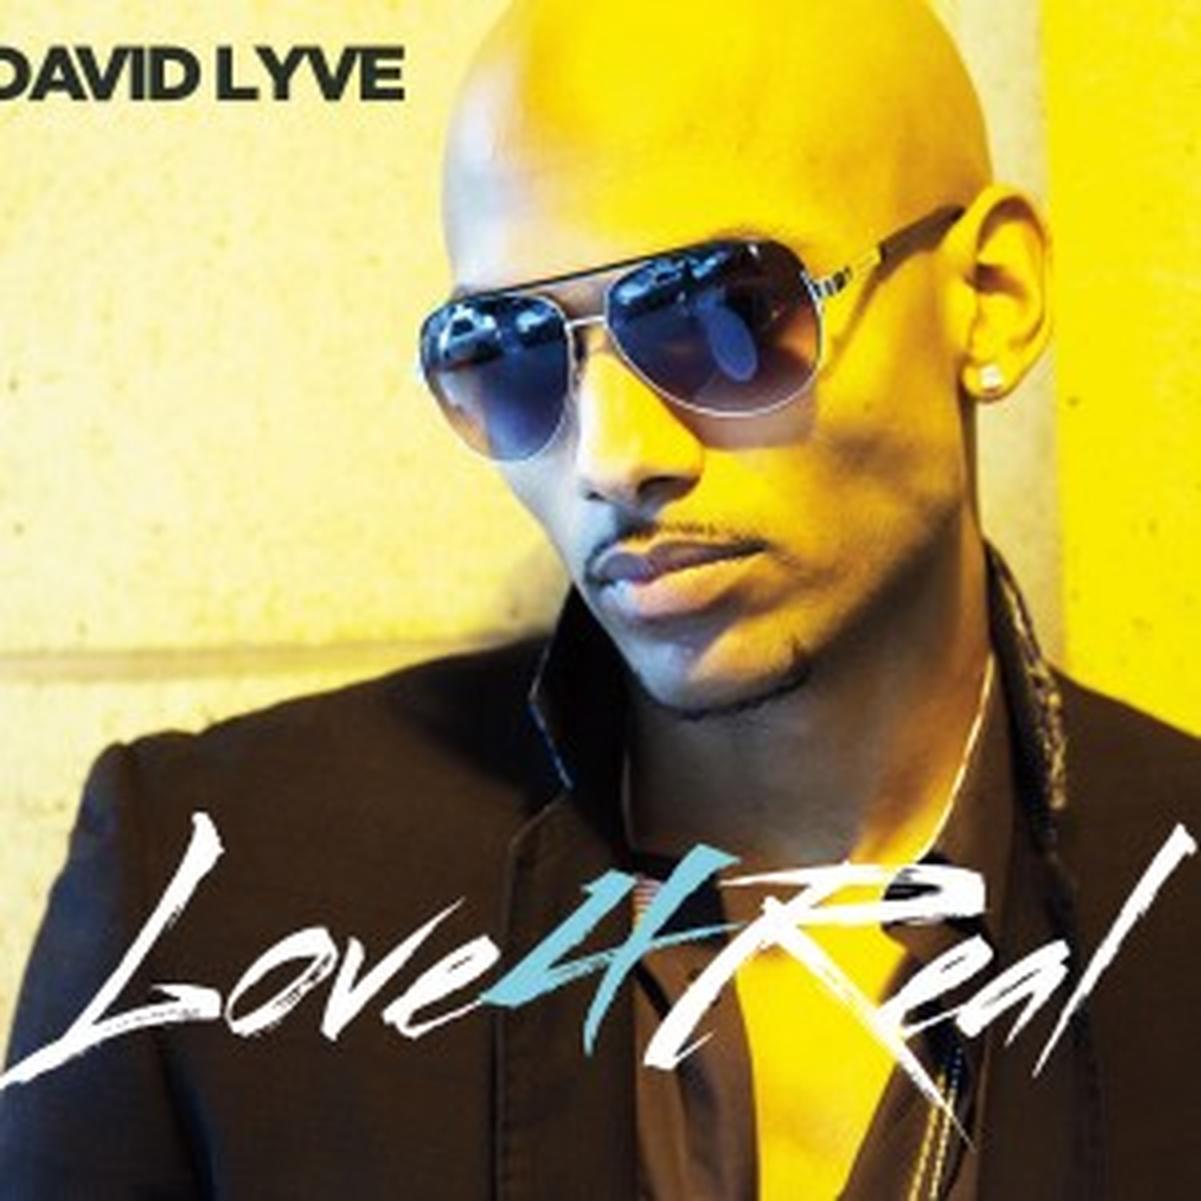 David Lyve